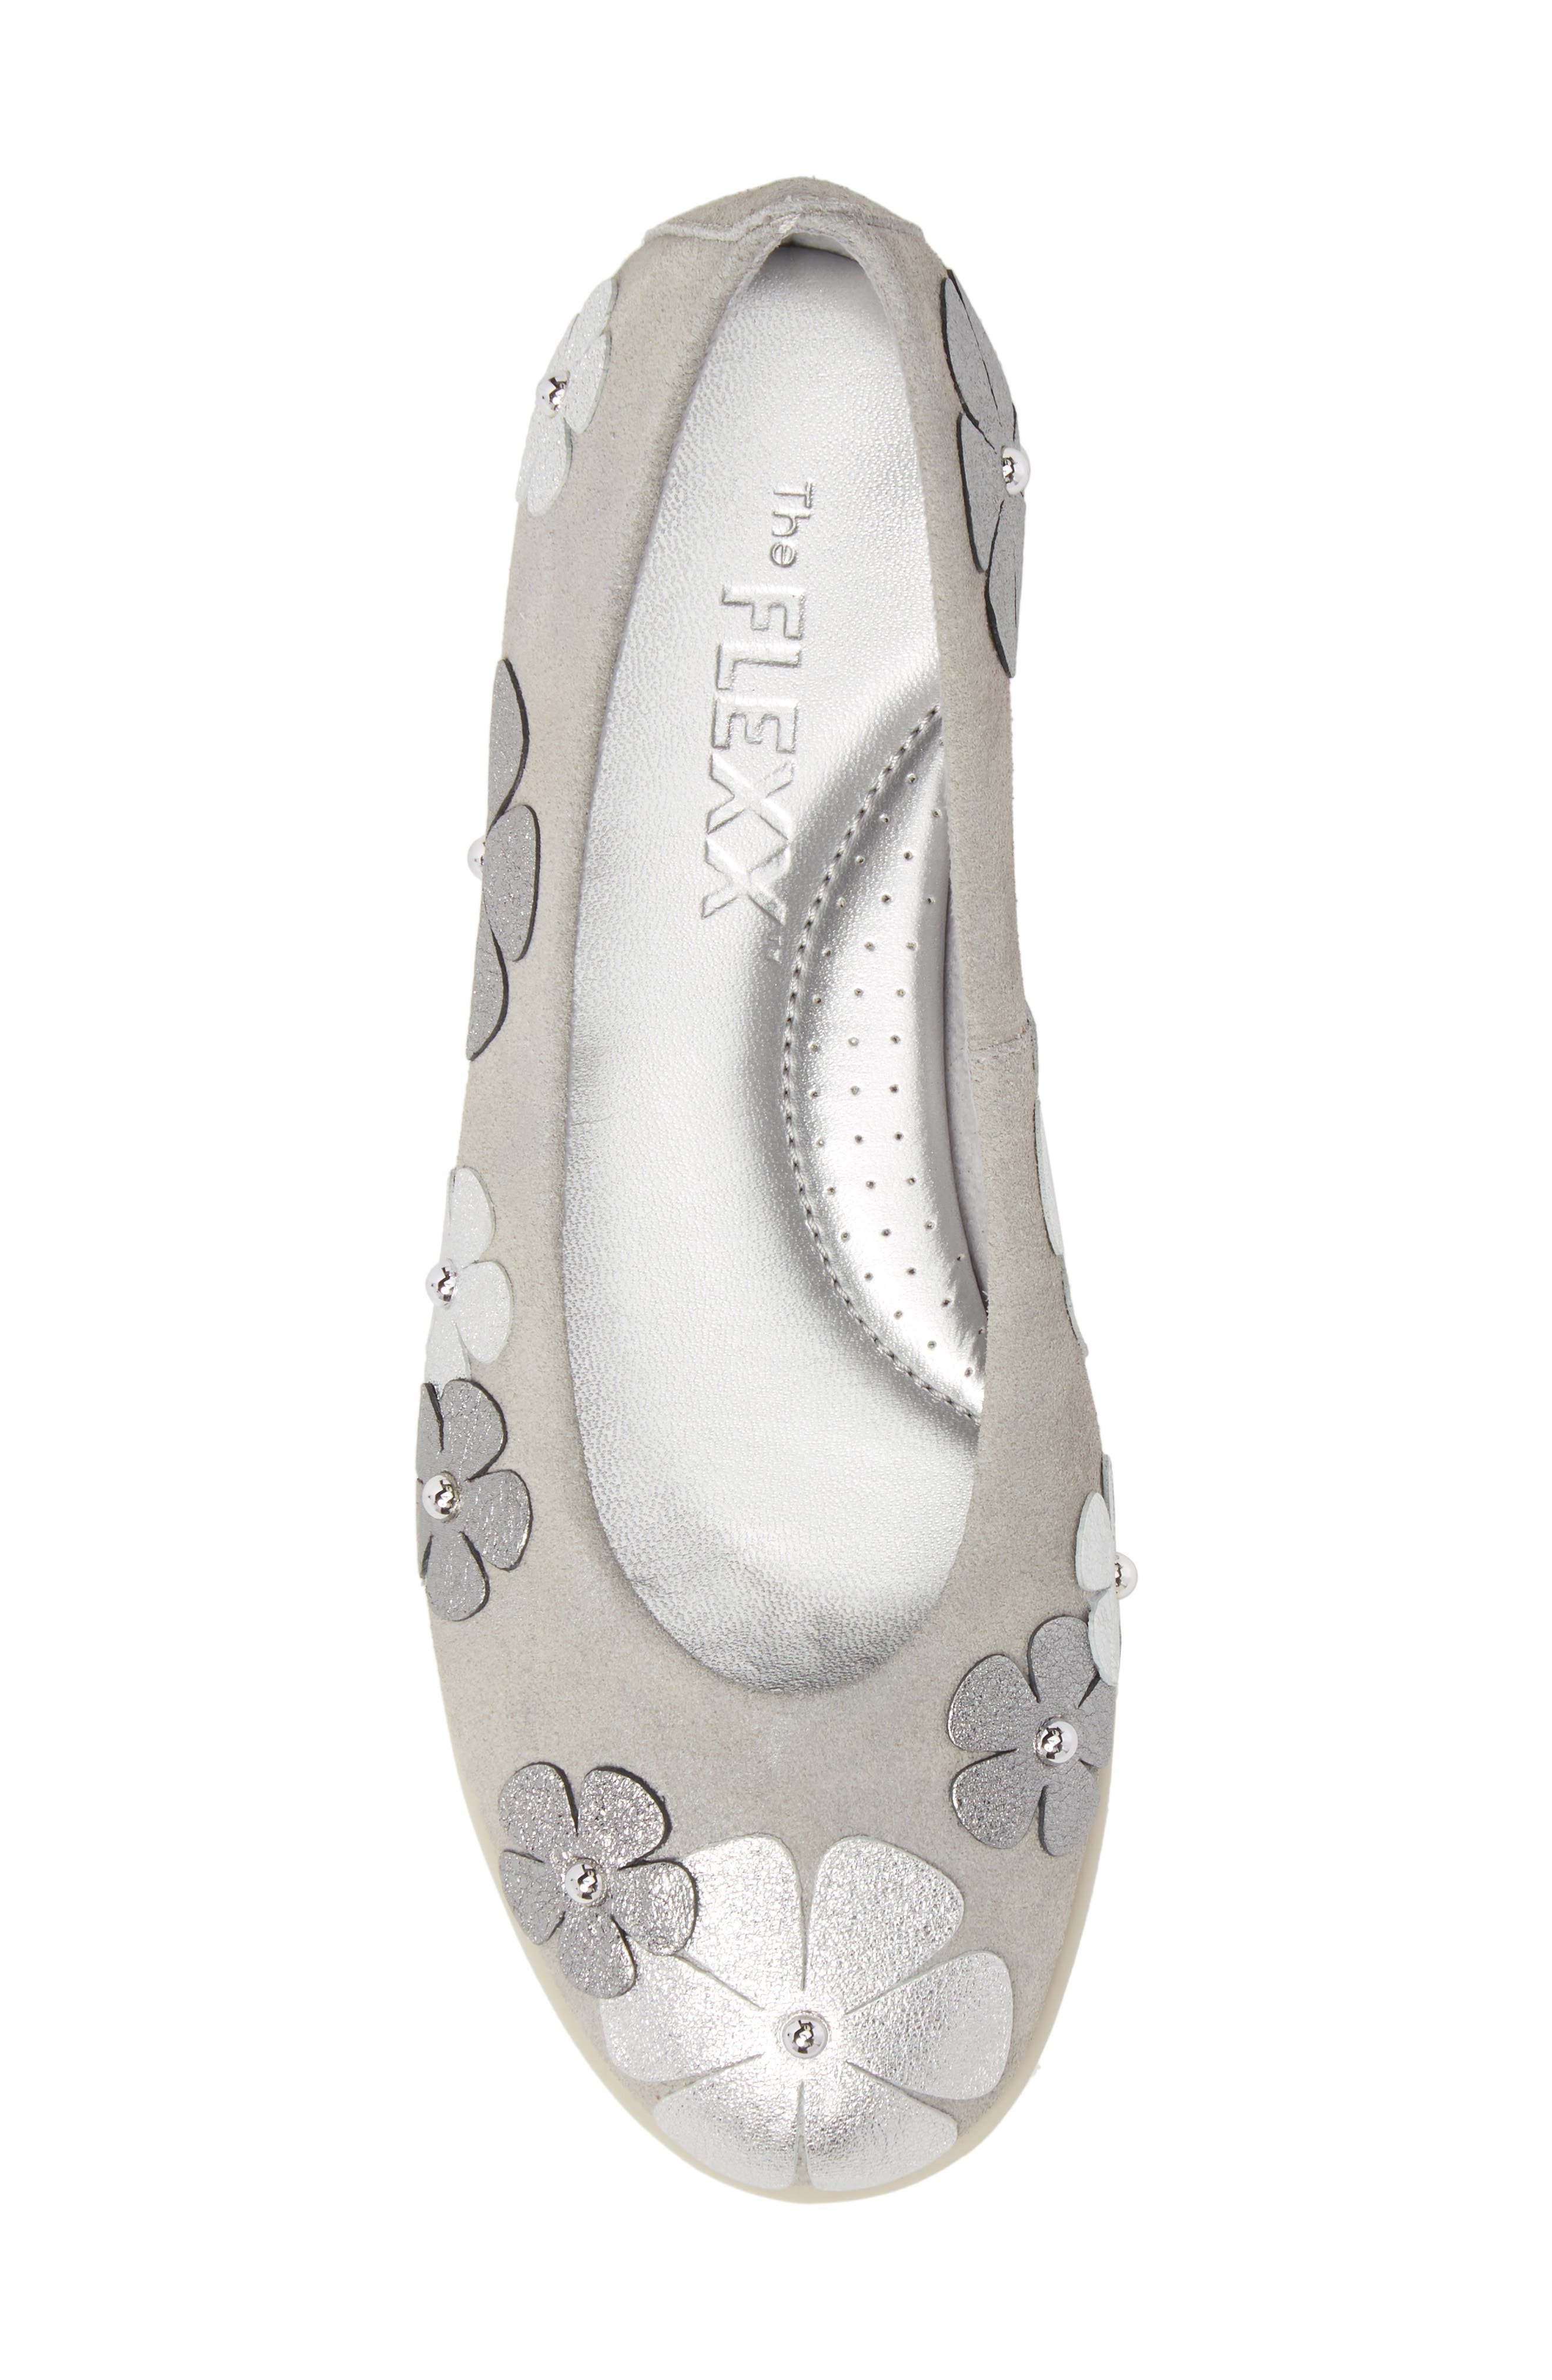 Miss Hippie Ballerina Flat,                             Alternate thumbnail 5, color,                             HAZE AURORA LEATHER